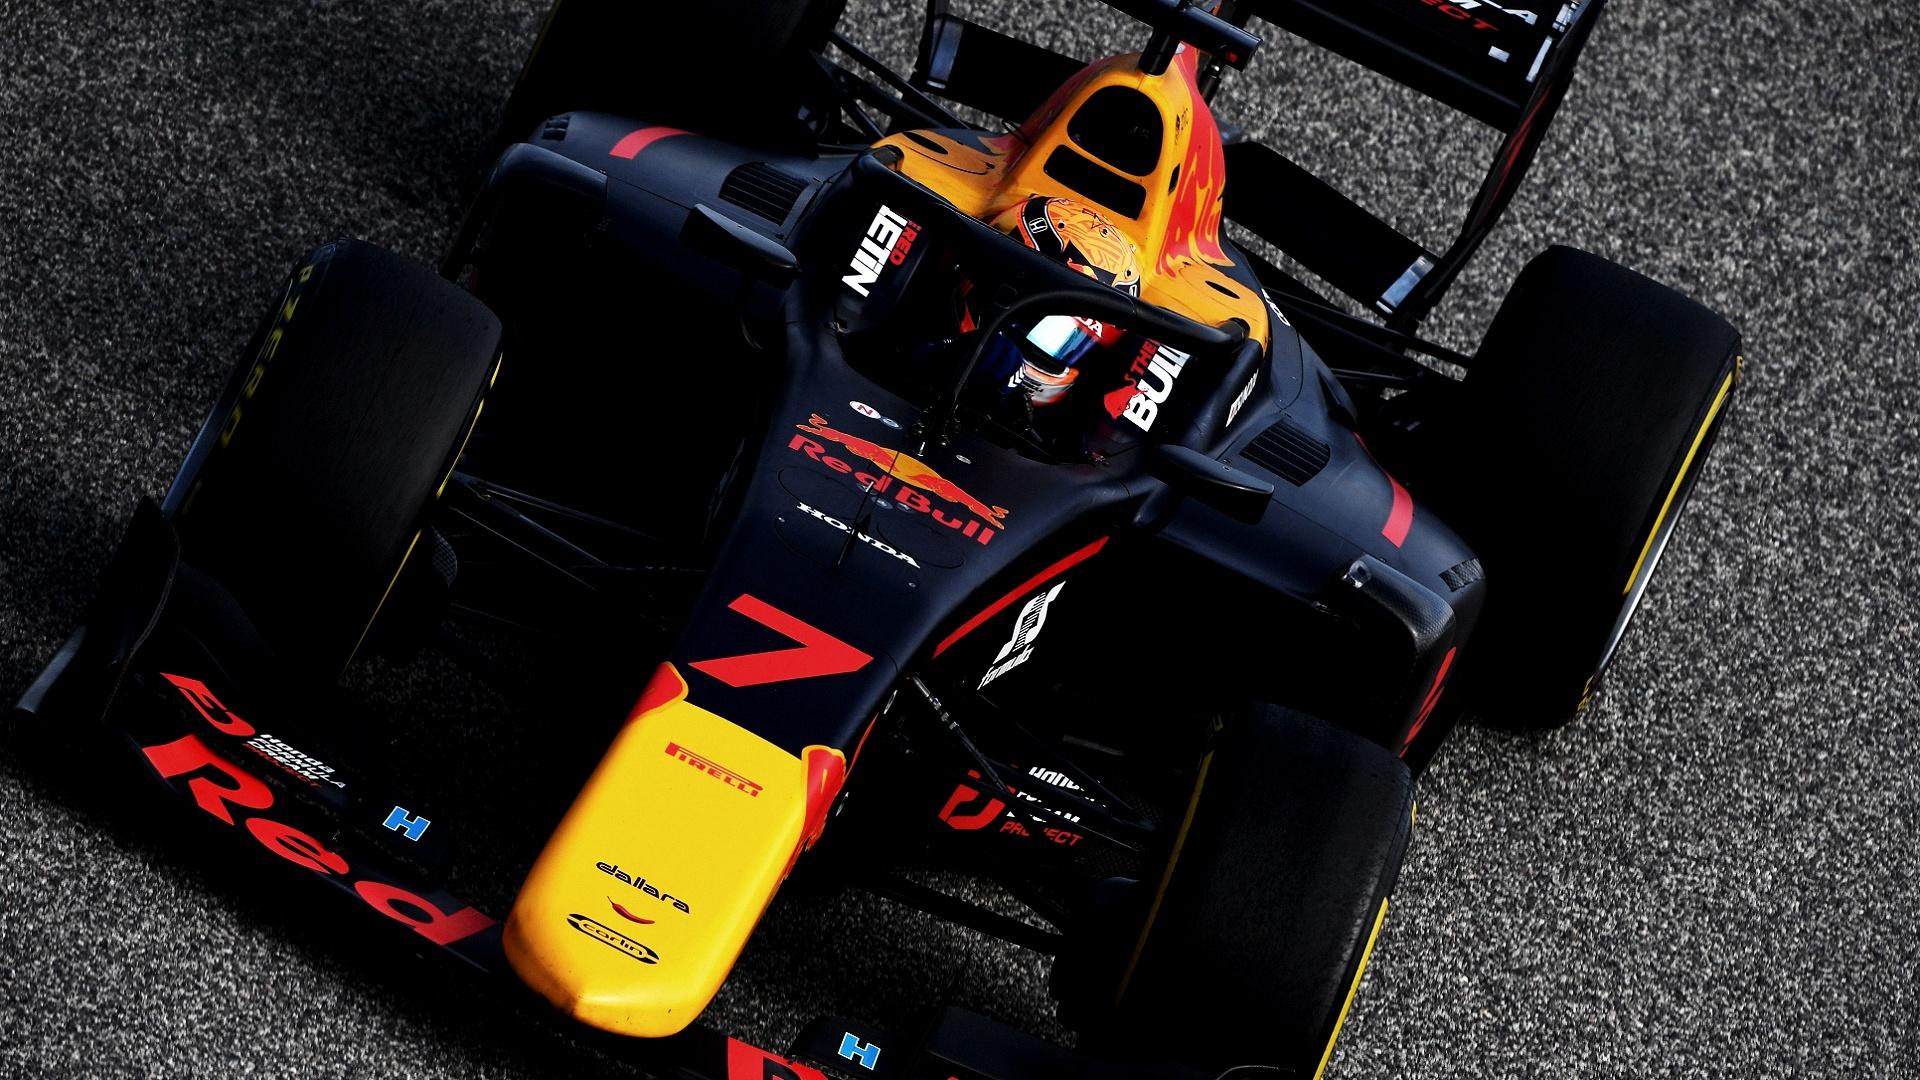 2020-11-29 F2 Formula 2 Tsunoda Yuki